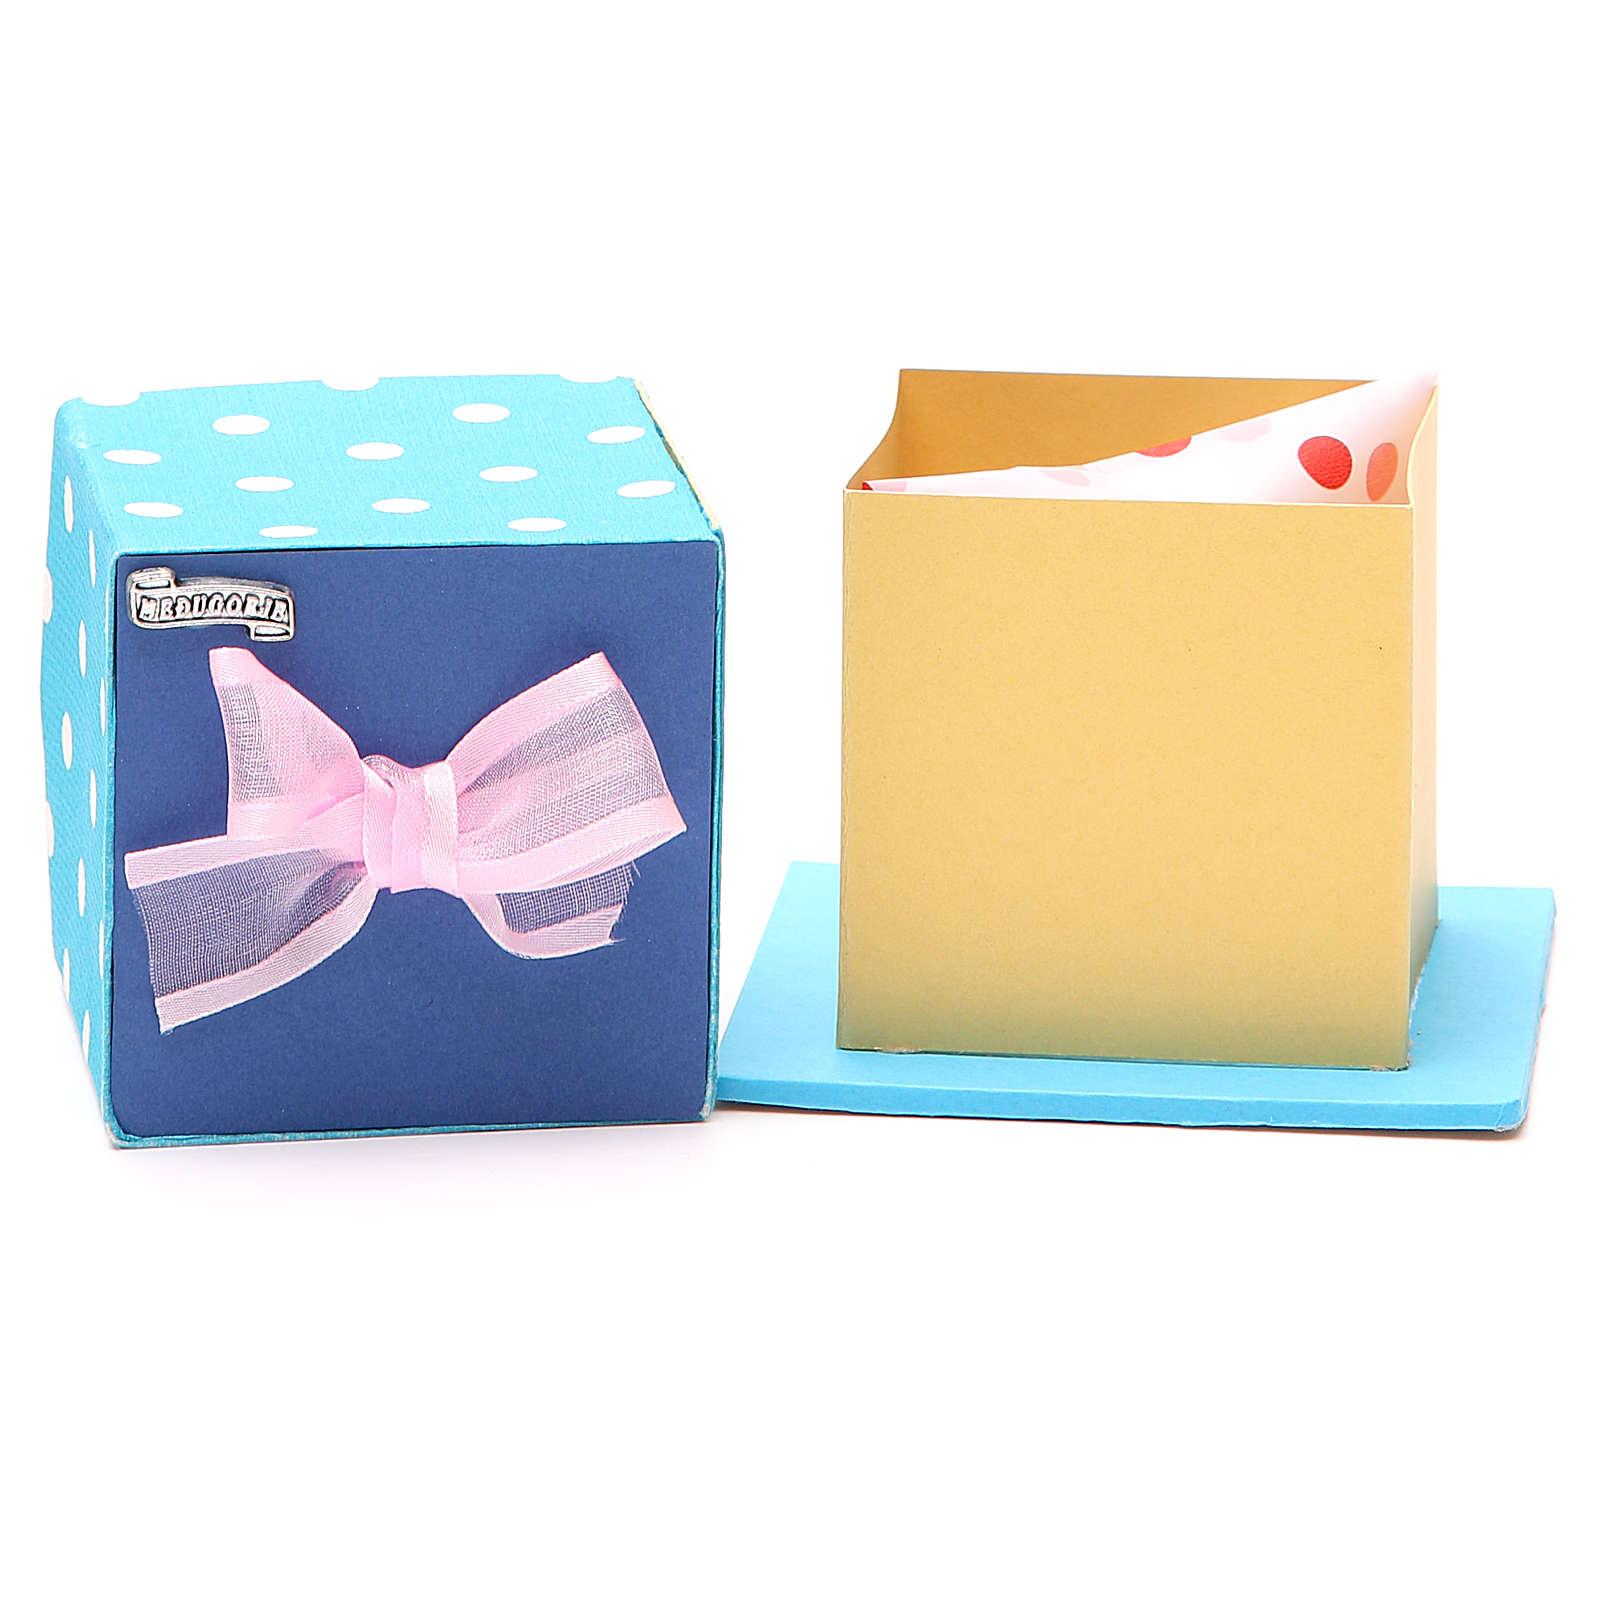 God's caresses box with pink ribbon, Medjugorje 4